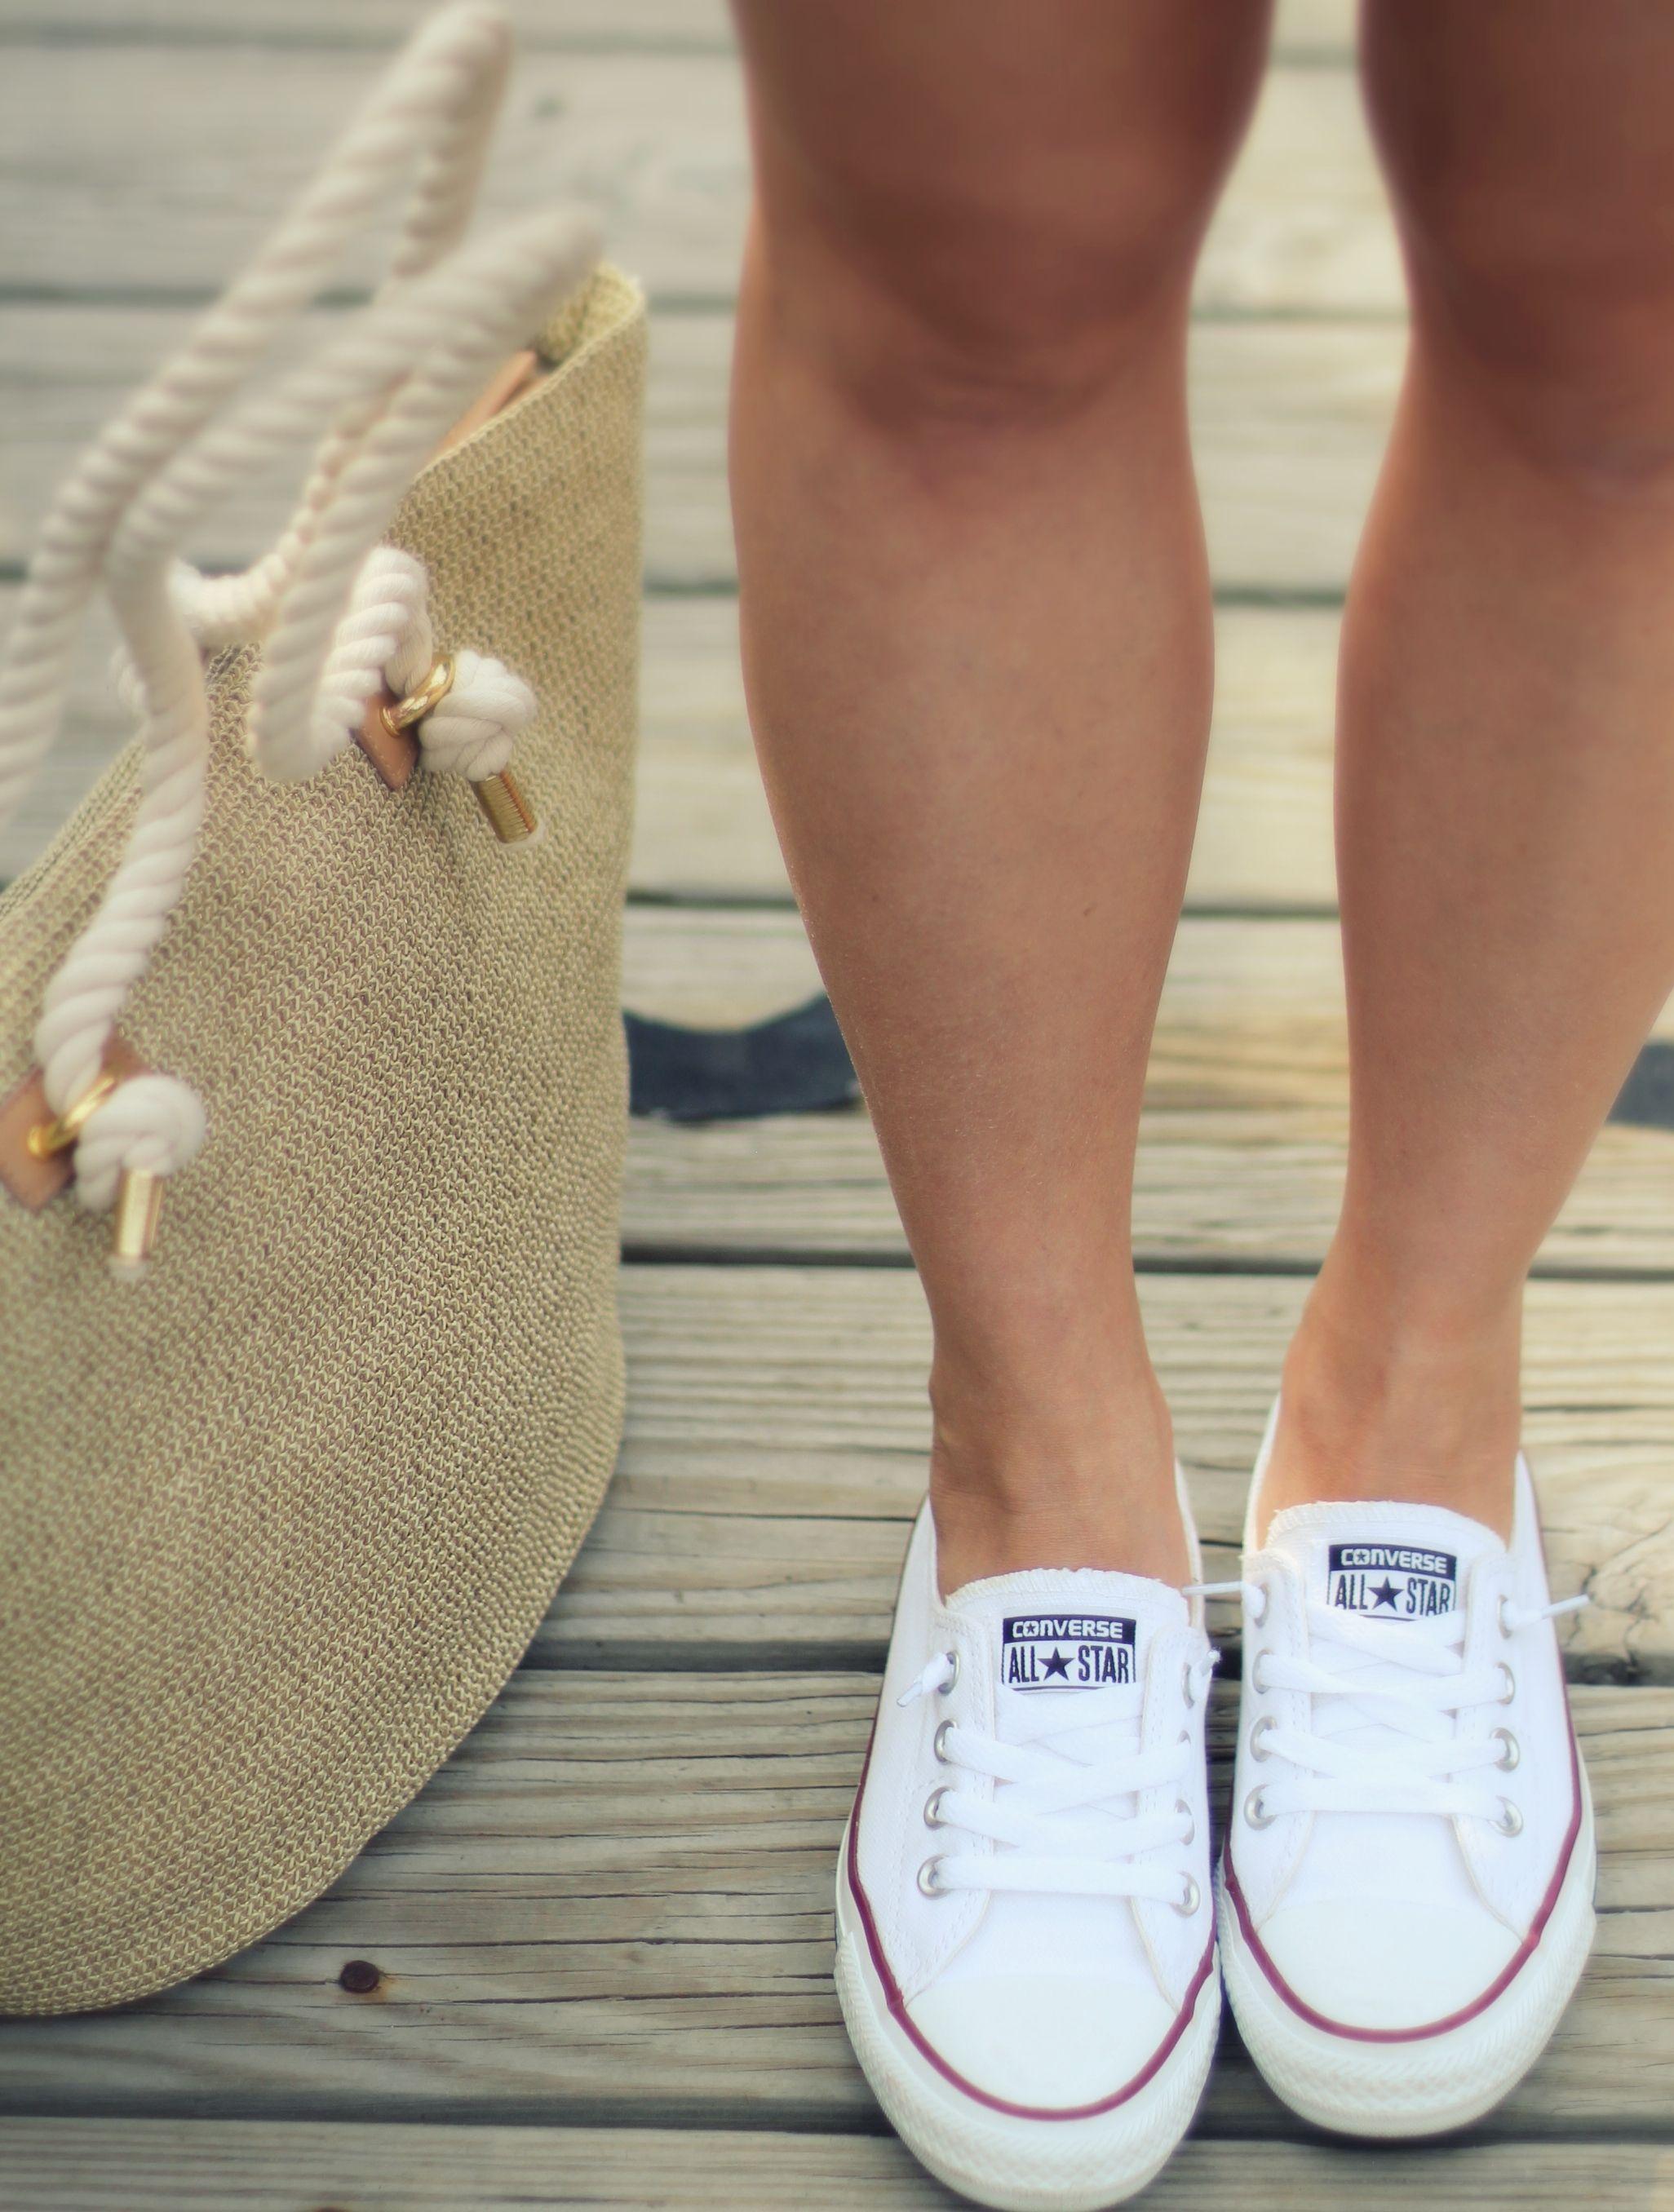 cf4dc8b59e4 Women s Shoes sneakers Converse Chuck Taylor All Star Ballet Lace Slip  549397C - Sneakerstudio.eu